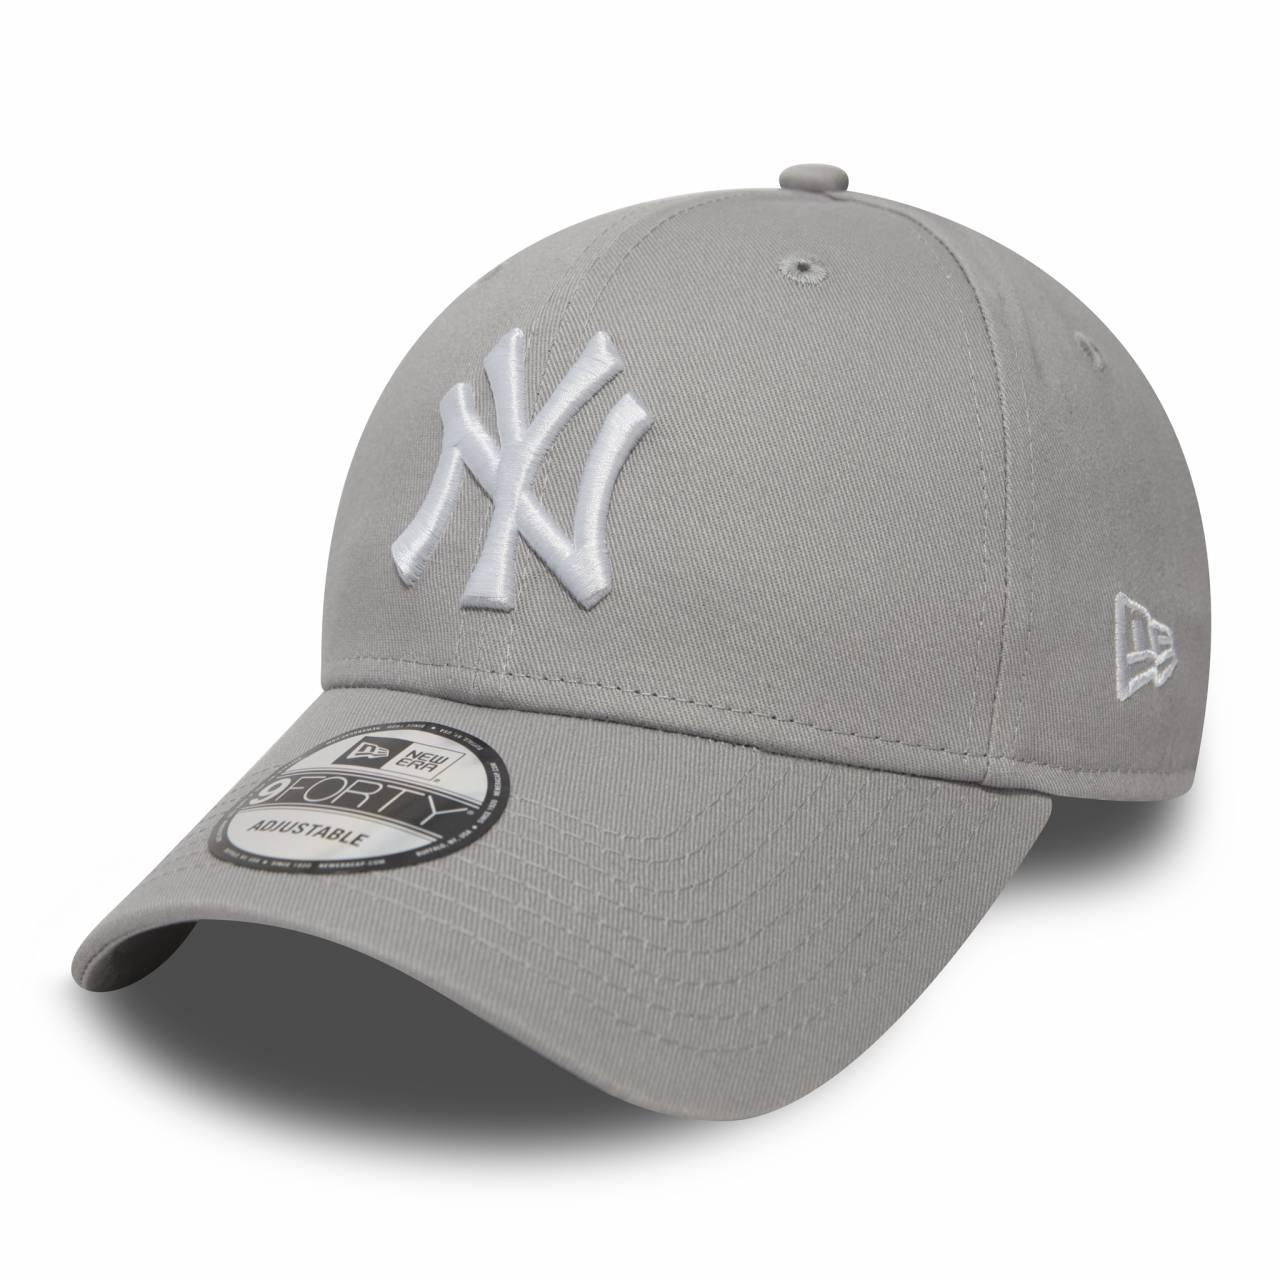 10531940 9FORTY NEW YORK YANKEES GRAY/WHITE CAP